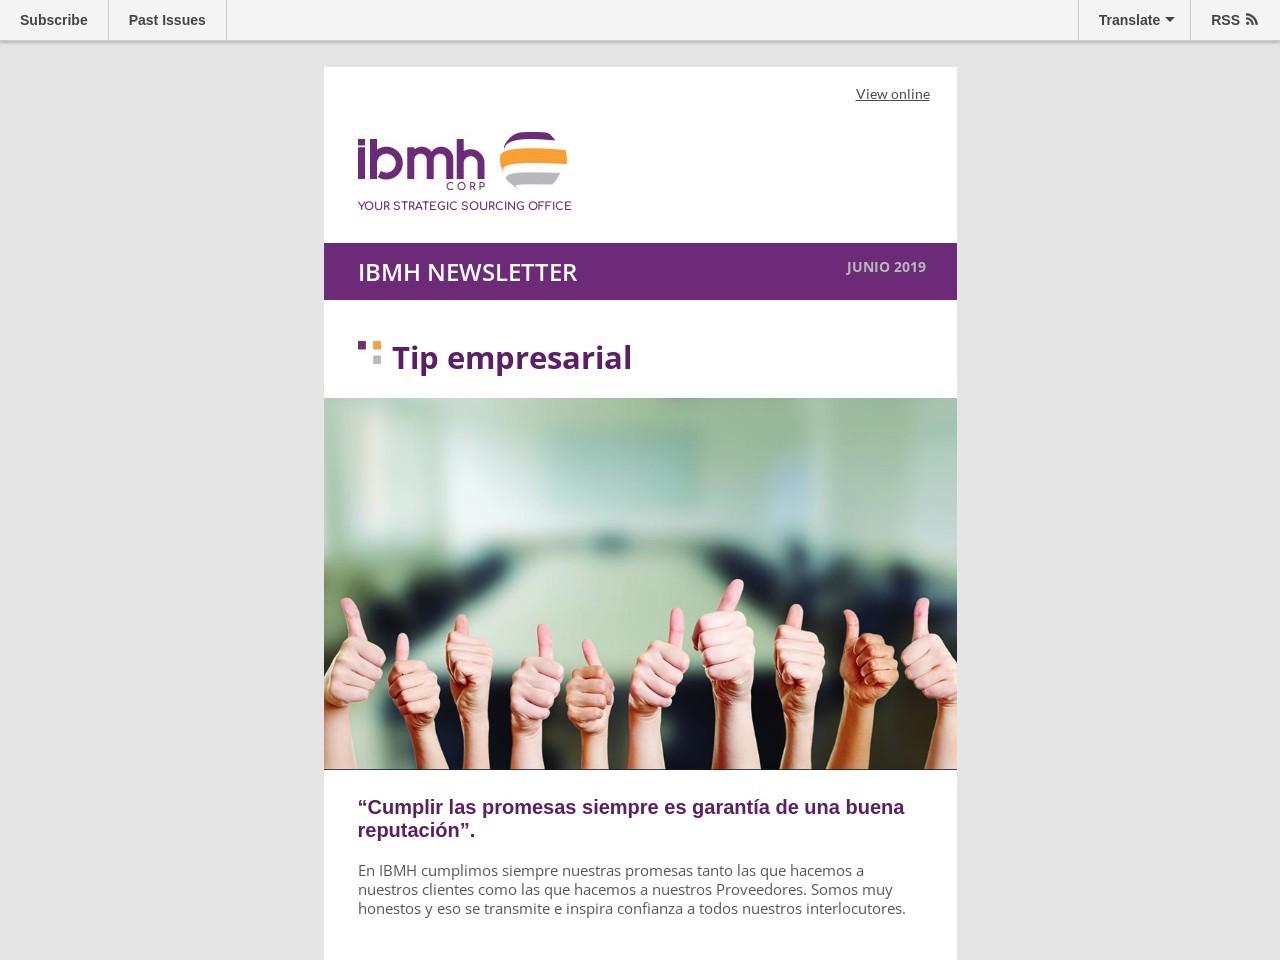 Boletín IBMH